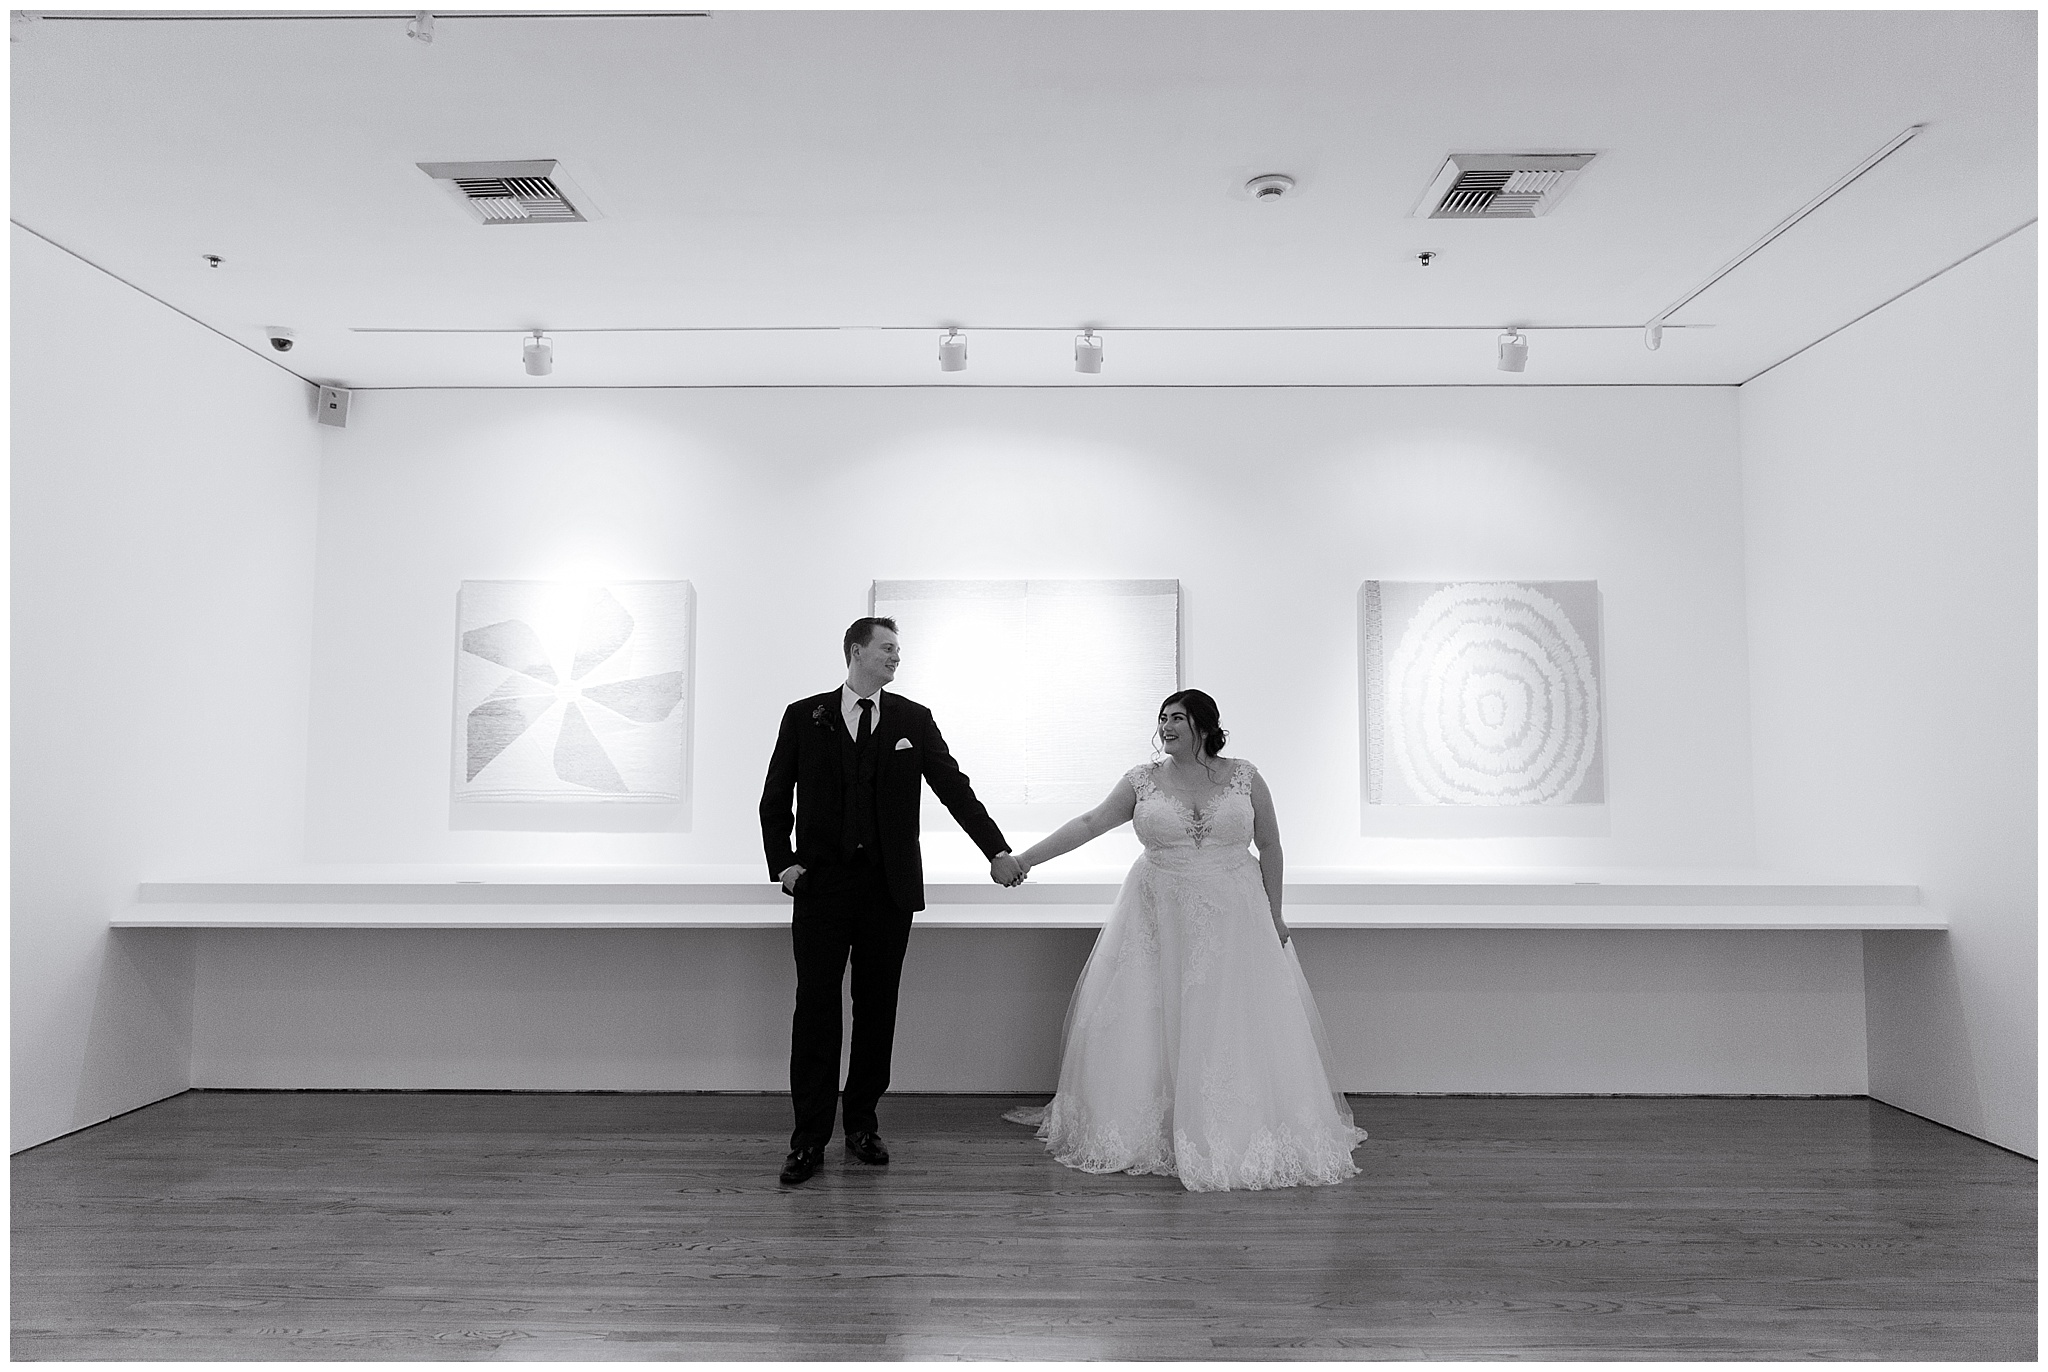 Carol_and_Grant_Wedding_3-3-18-8437.jpg